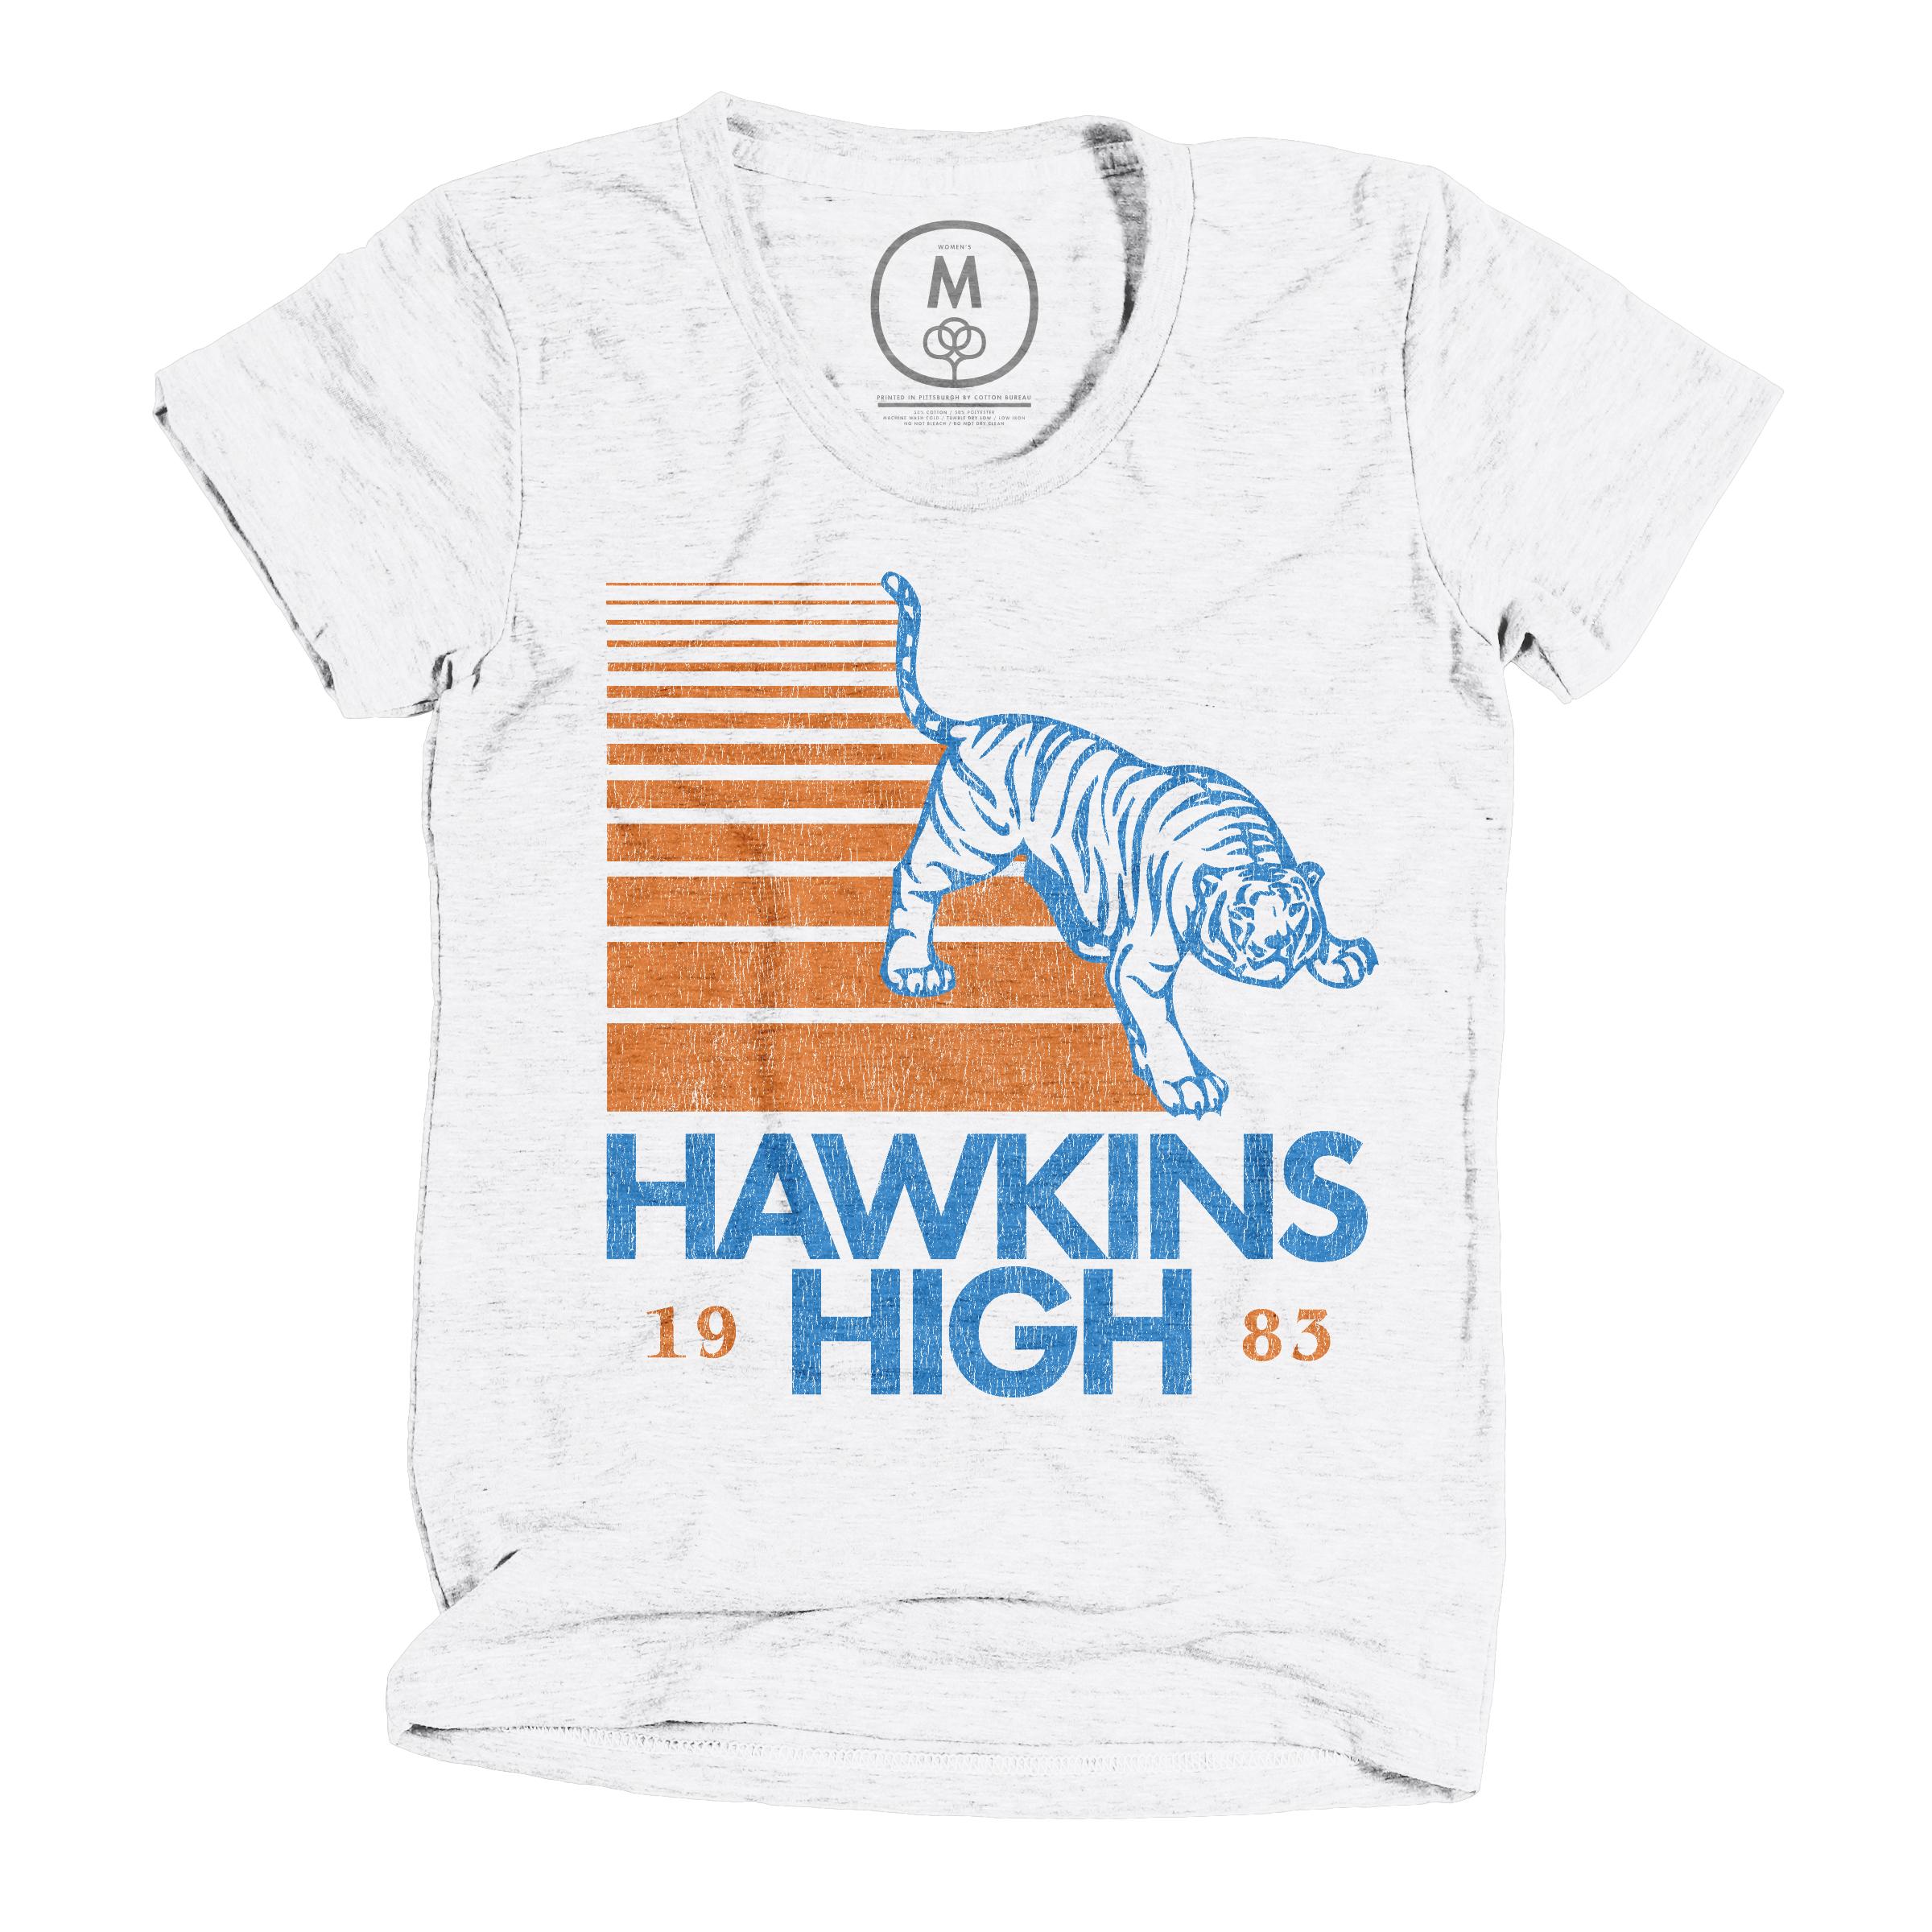 Hawkins High Heather White (Women's)